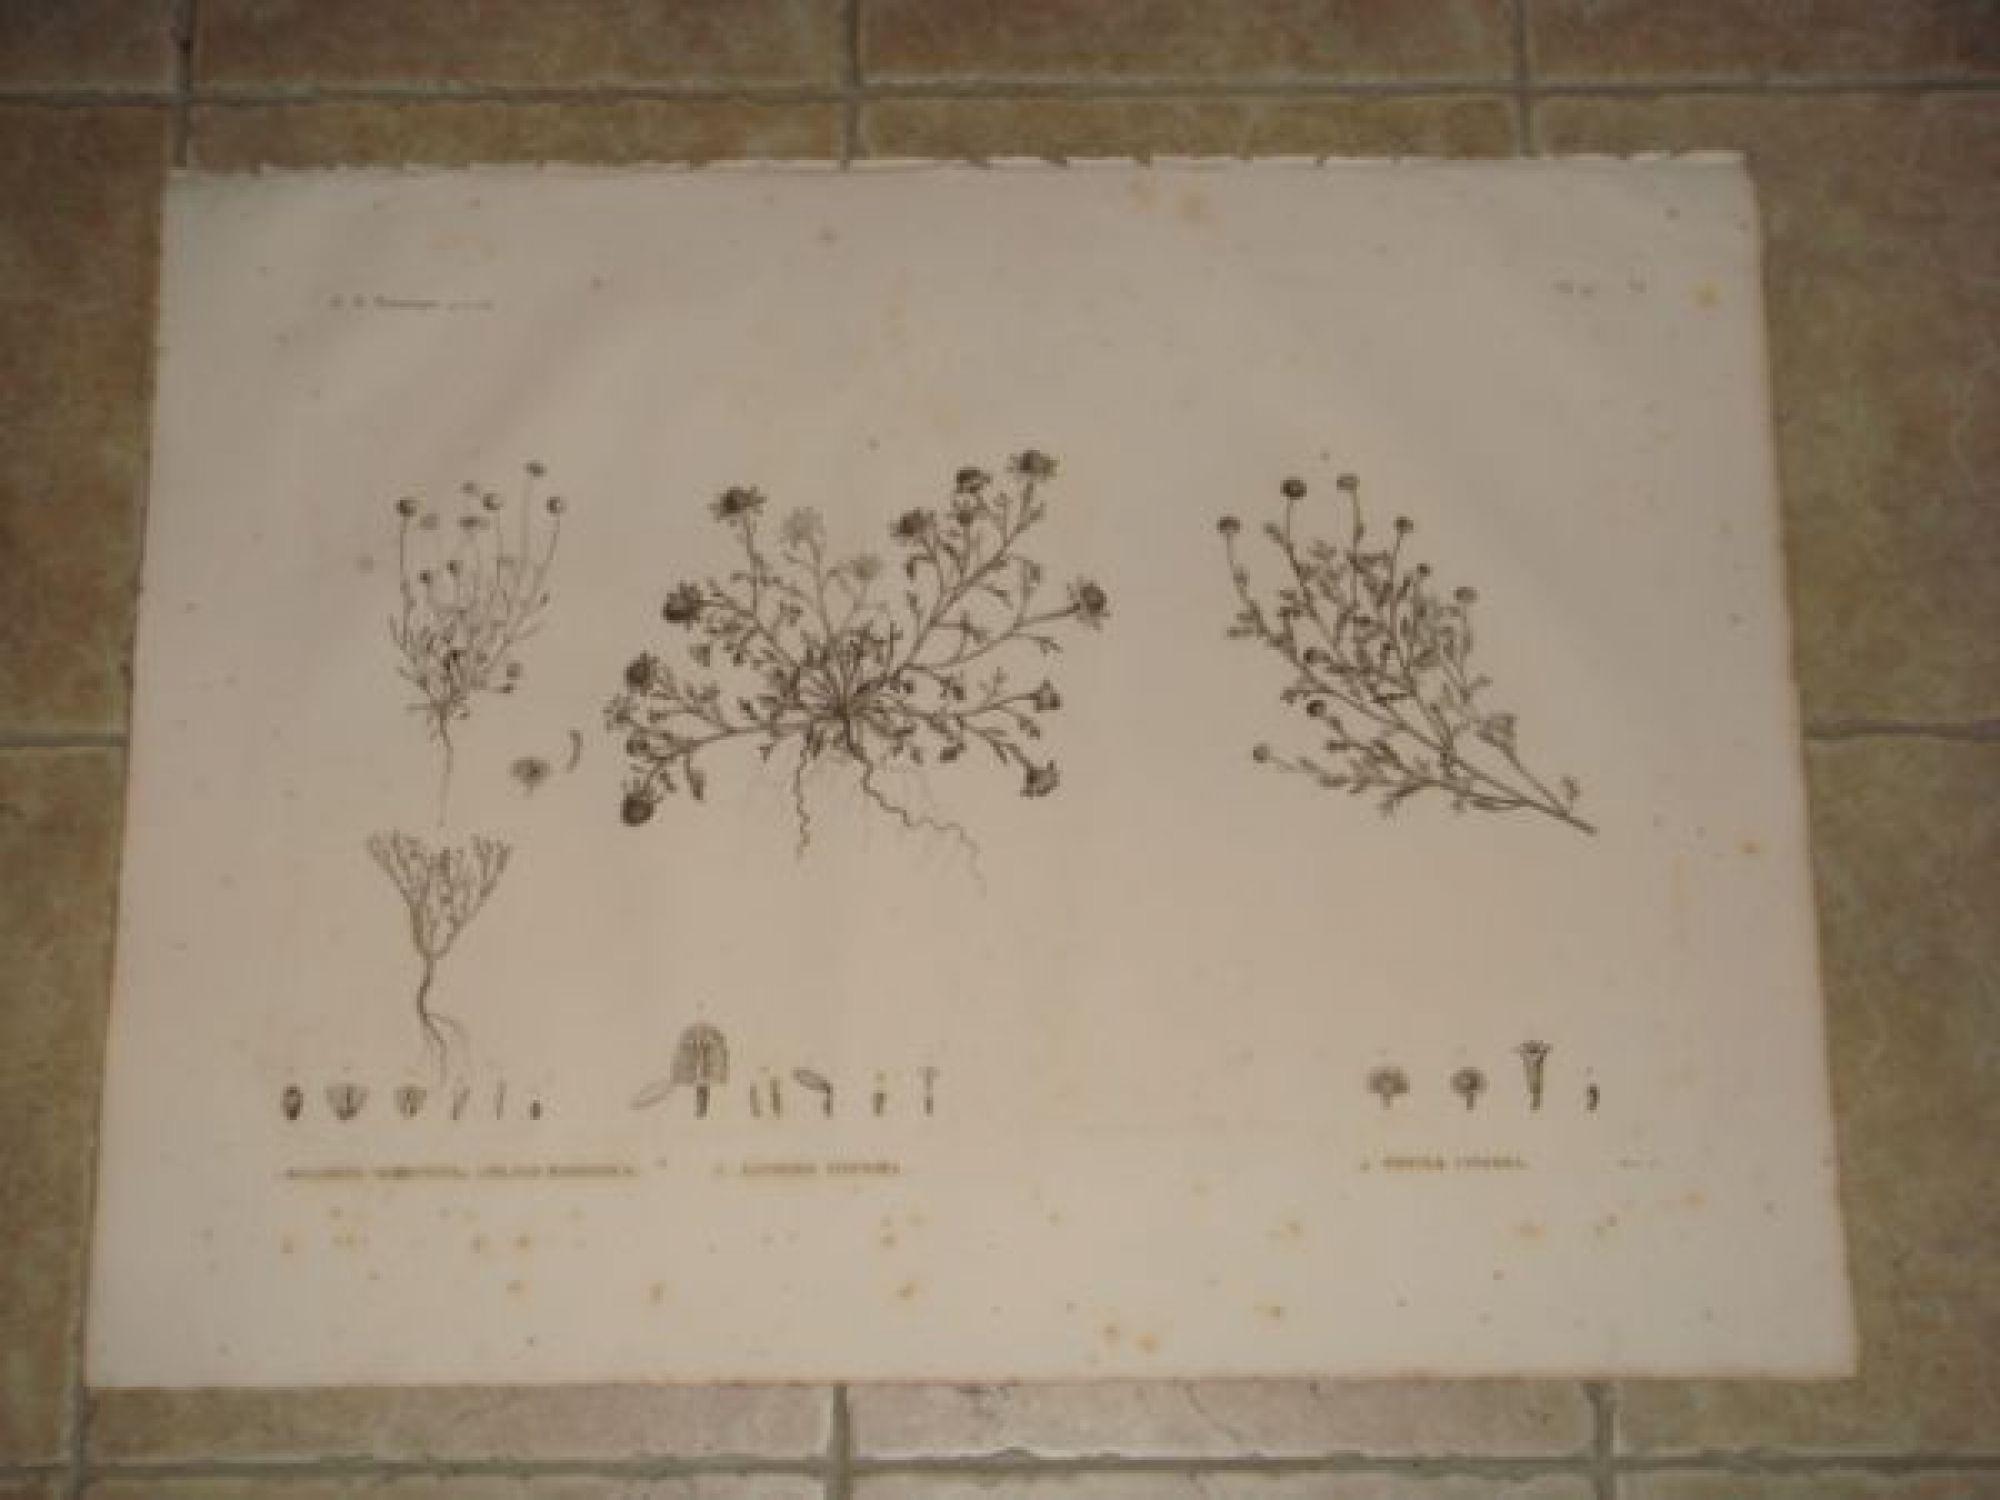 description de l 39 egypte botanique balsamita tridentata filago mareotica anthemis indurata. Black Bedroom Furniture Sets. Home Design Ideas